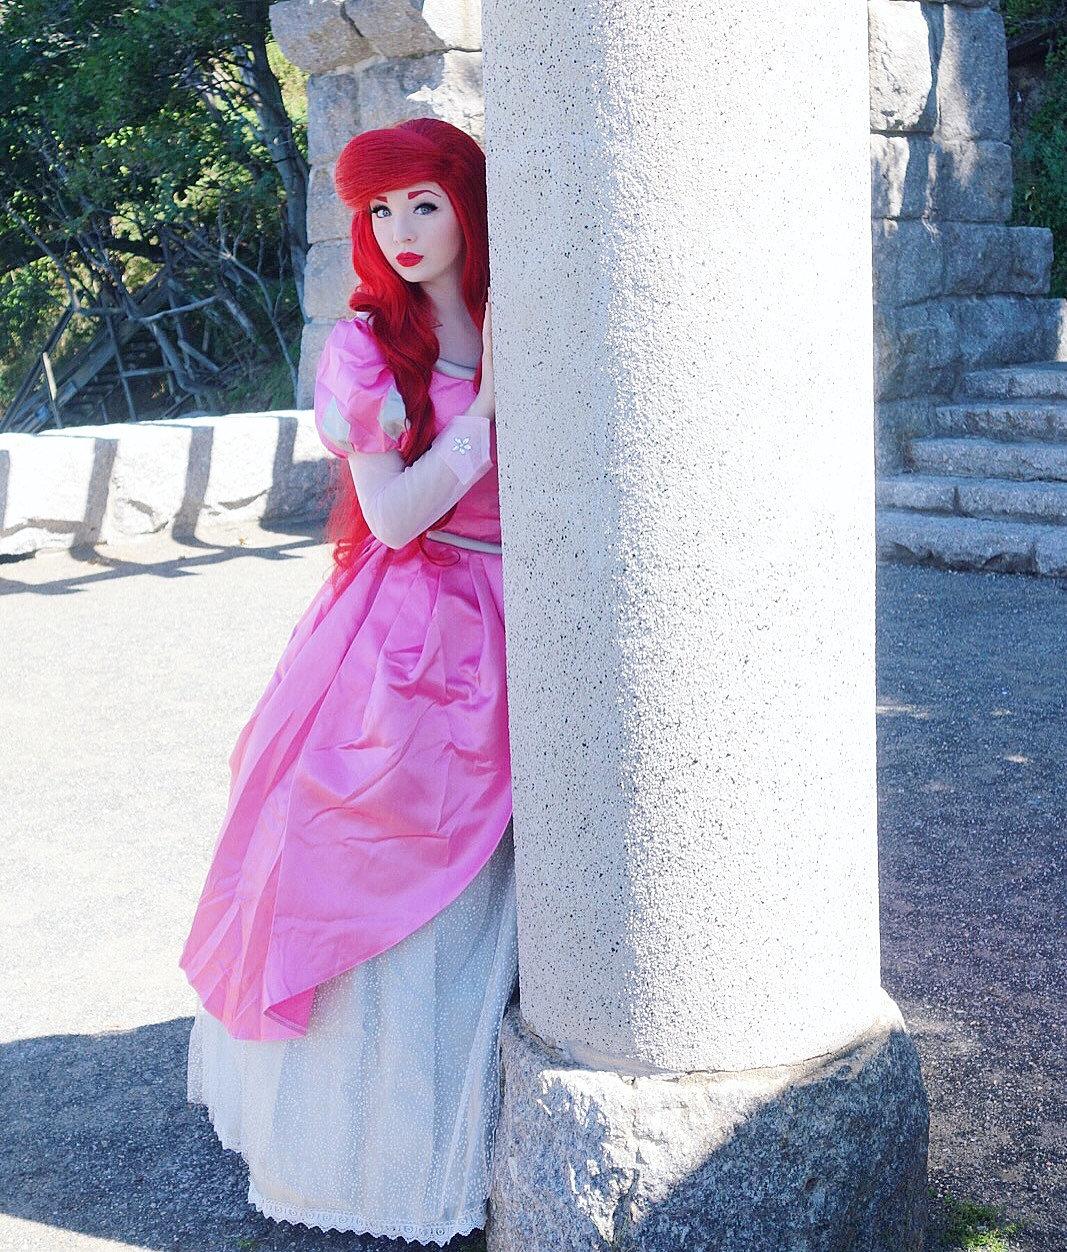 royal-princess-prep  The Little Mermaid (Pink Dress)